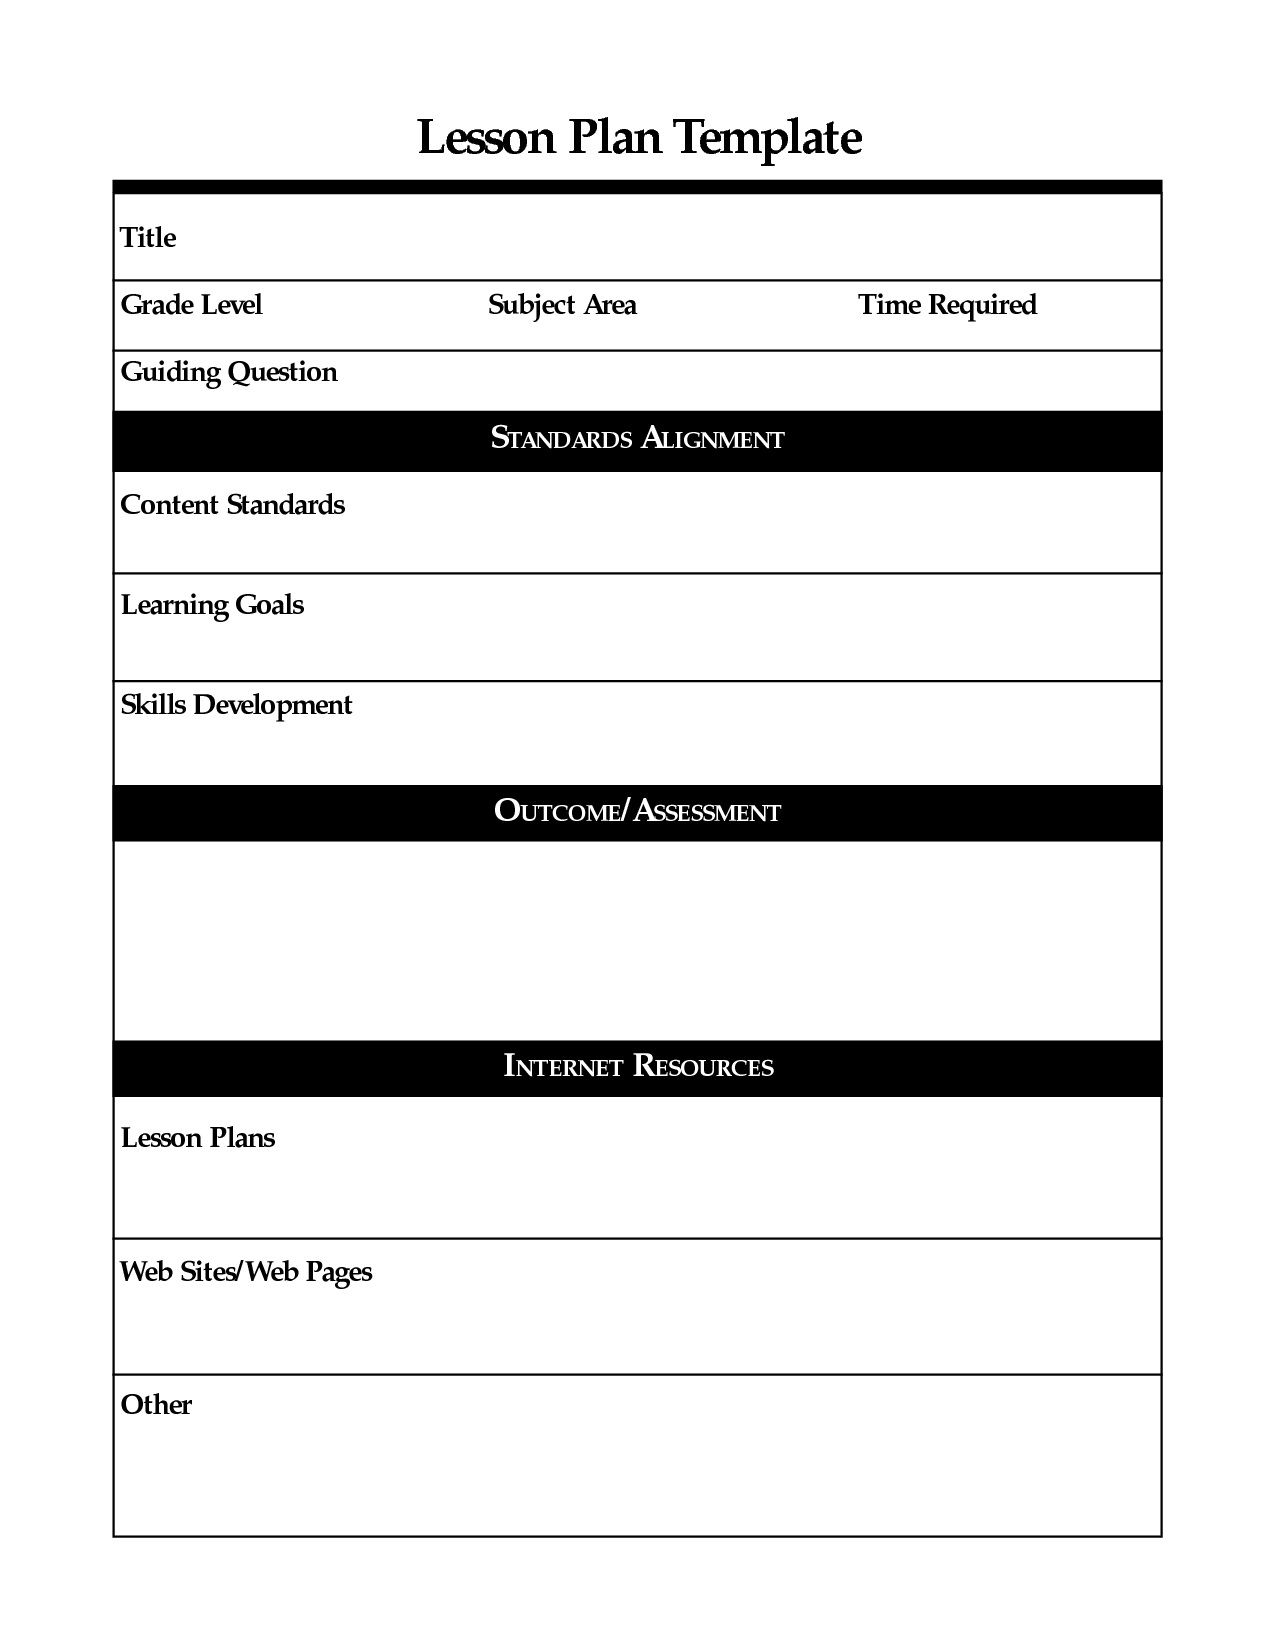 001 Wondrou Free Printable Lesson Plan Template Inspiration  Preschool Weekly For KindergartenFull